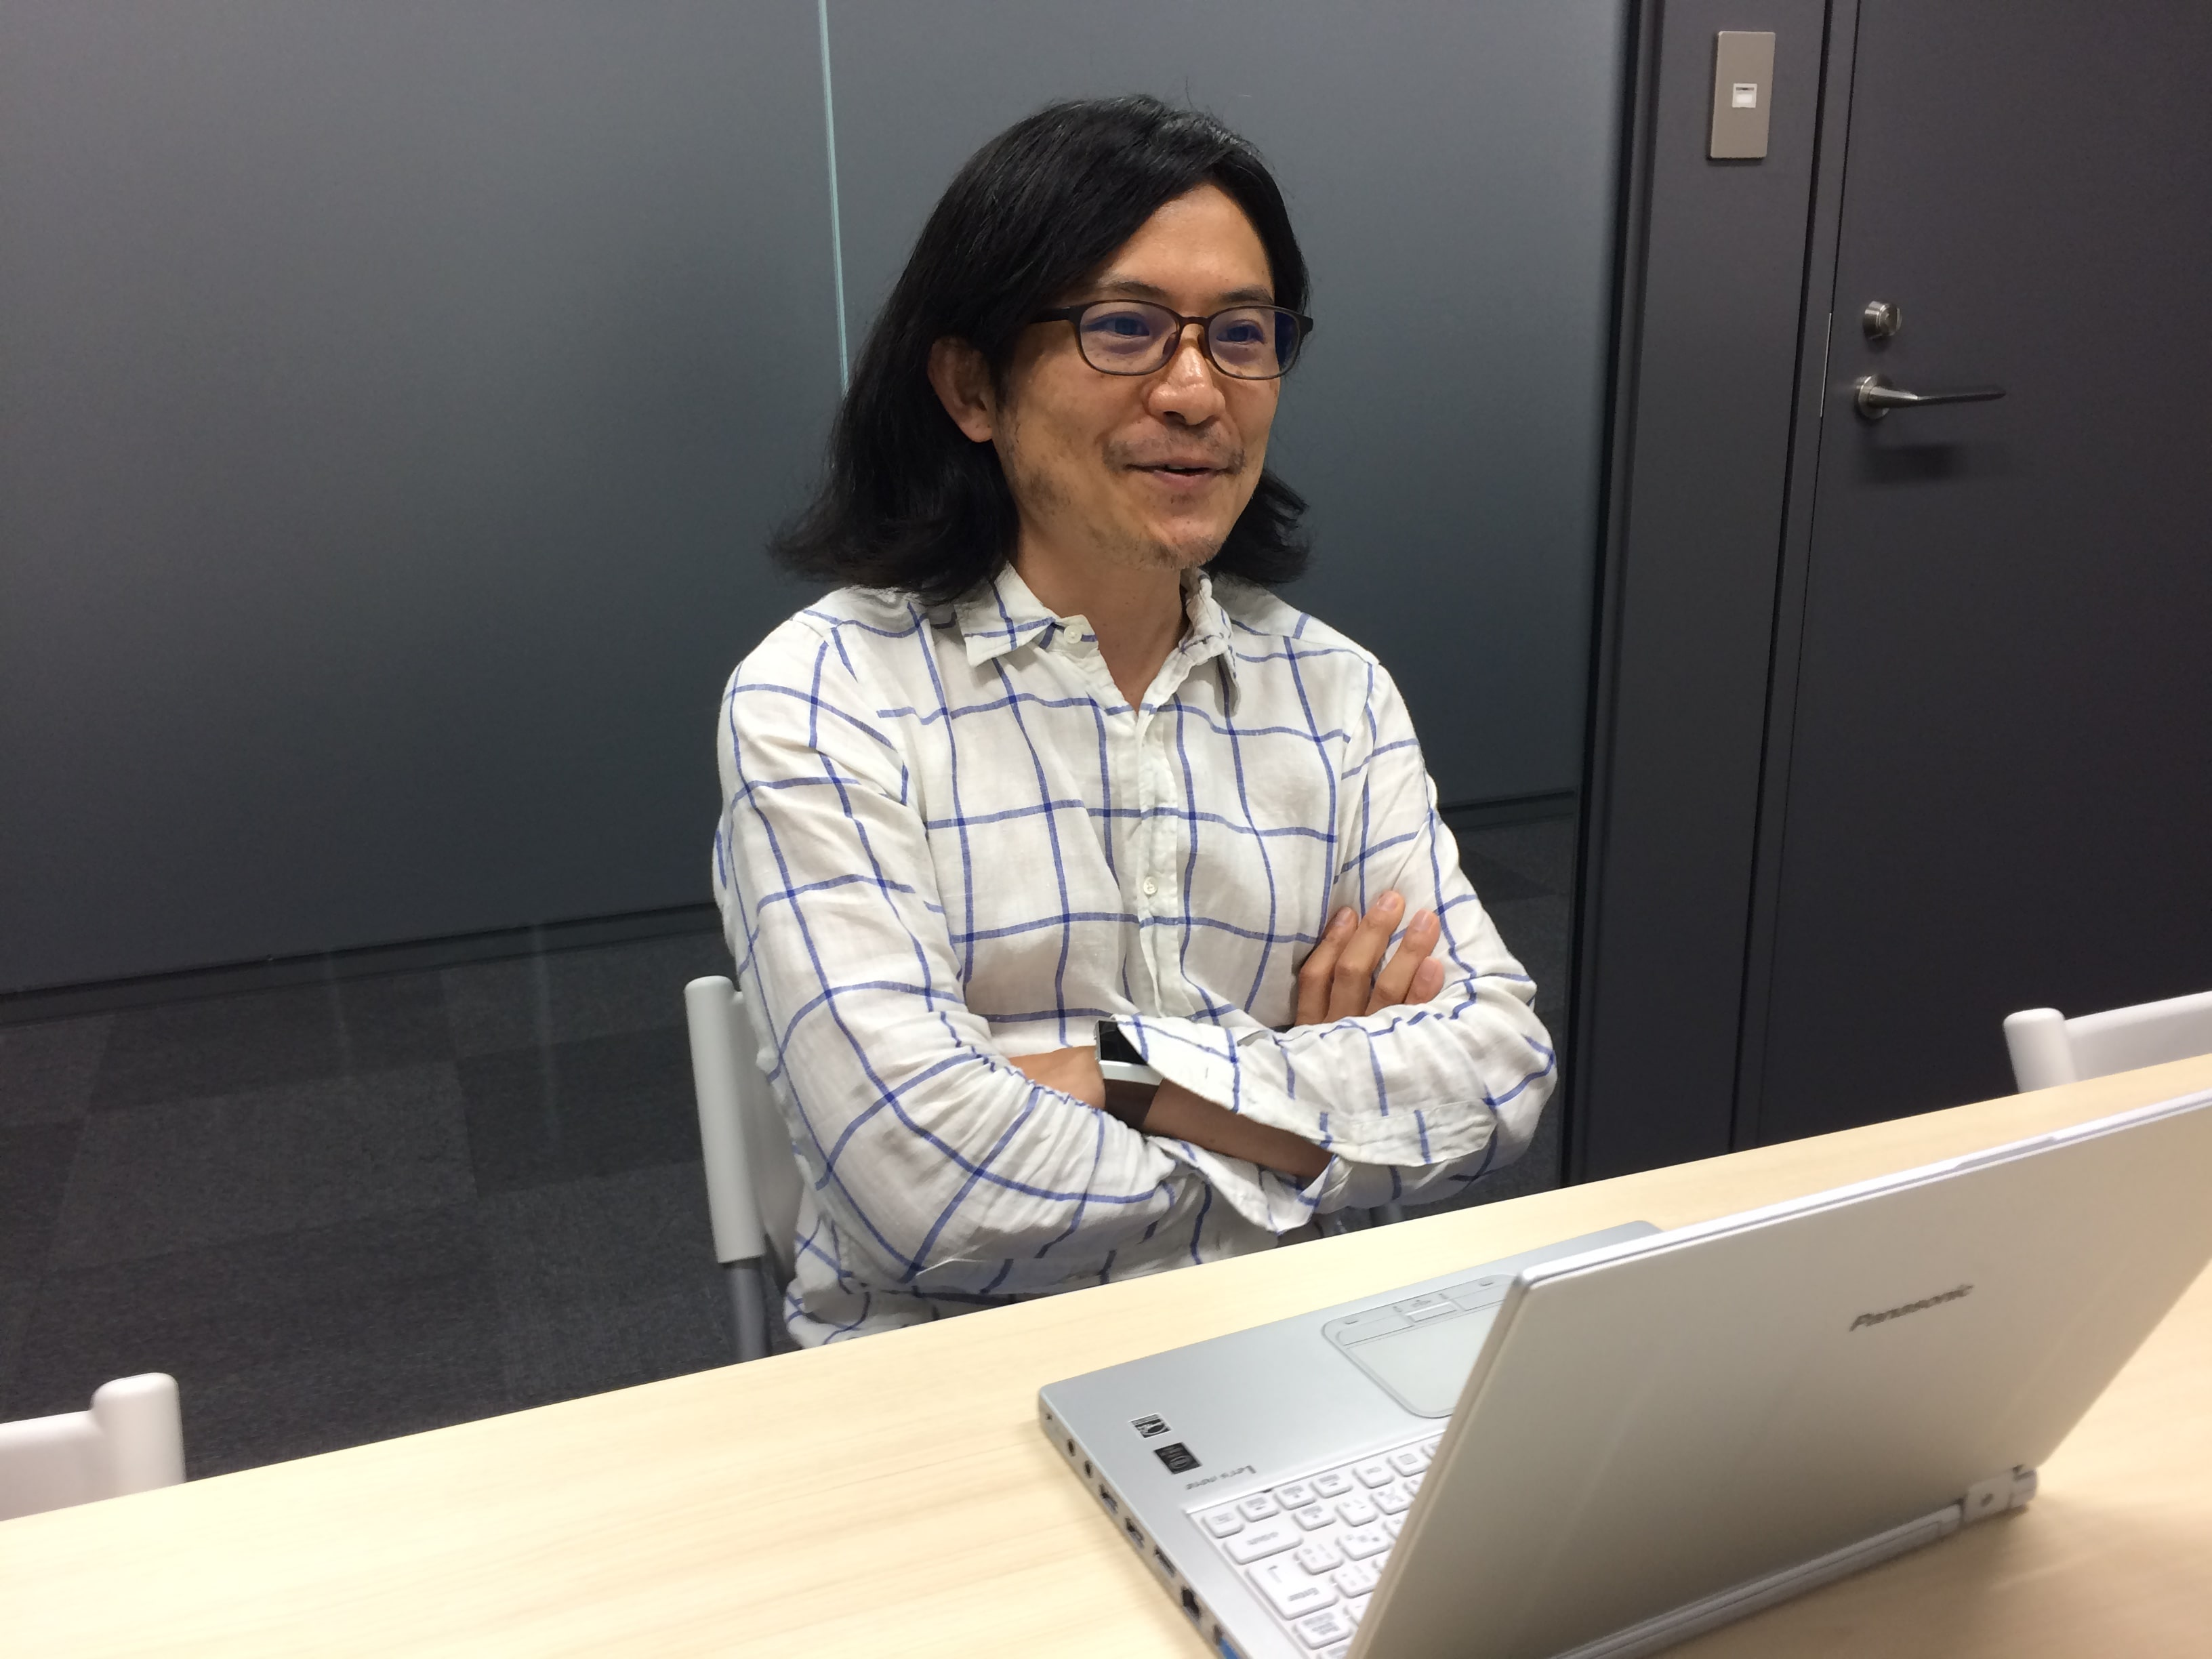 Stock(ストック)インタビュー田村大輔様写真